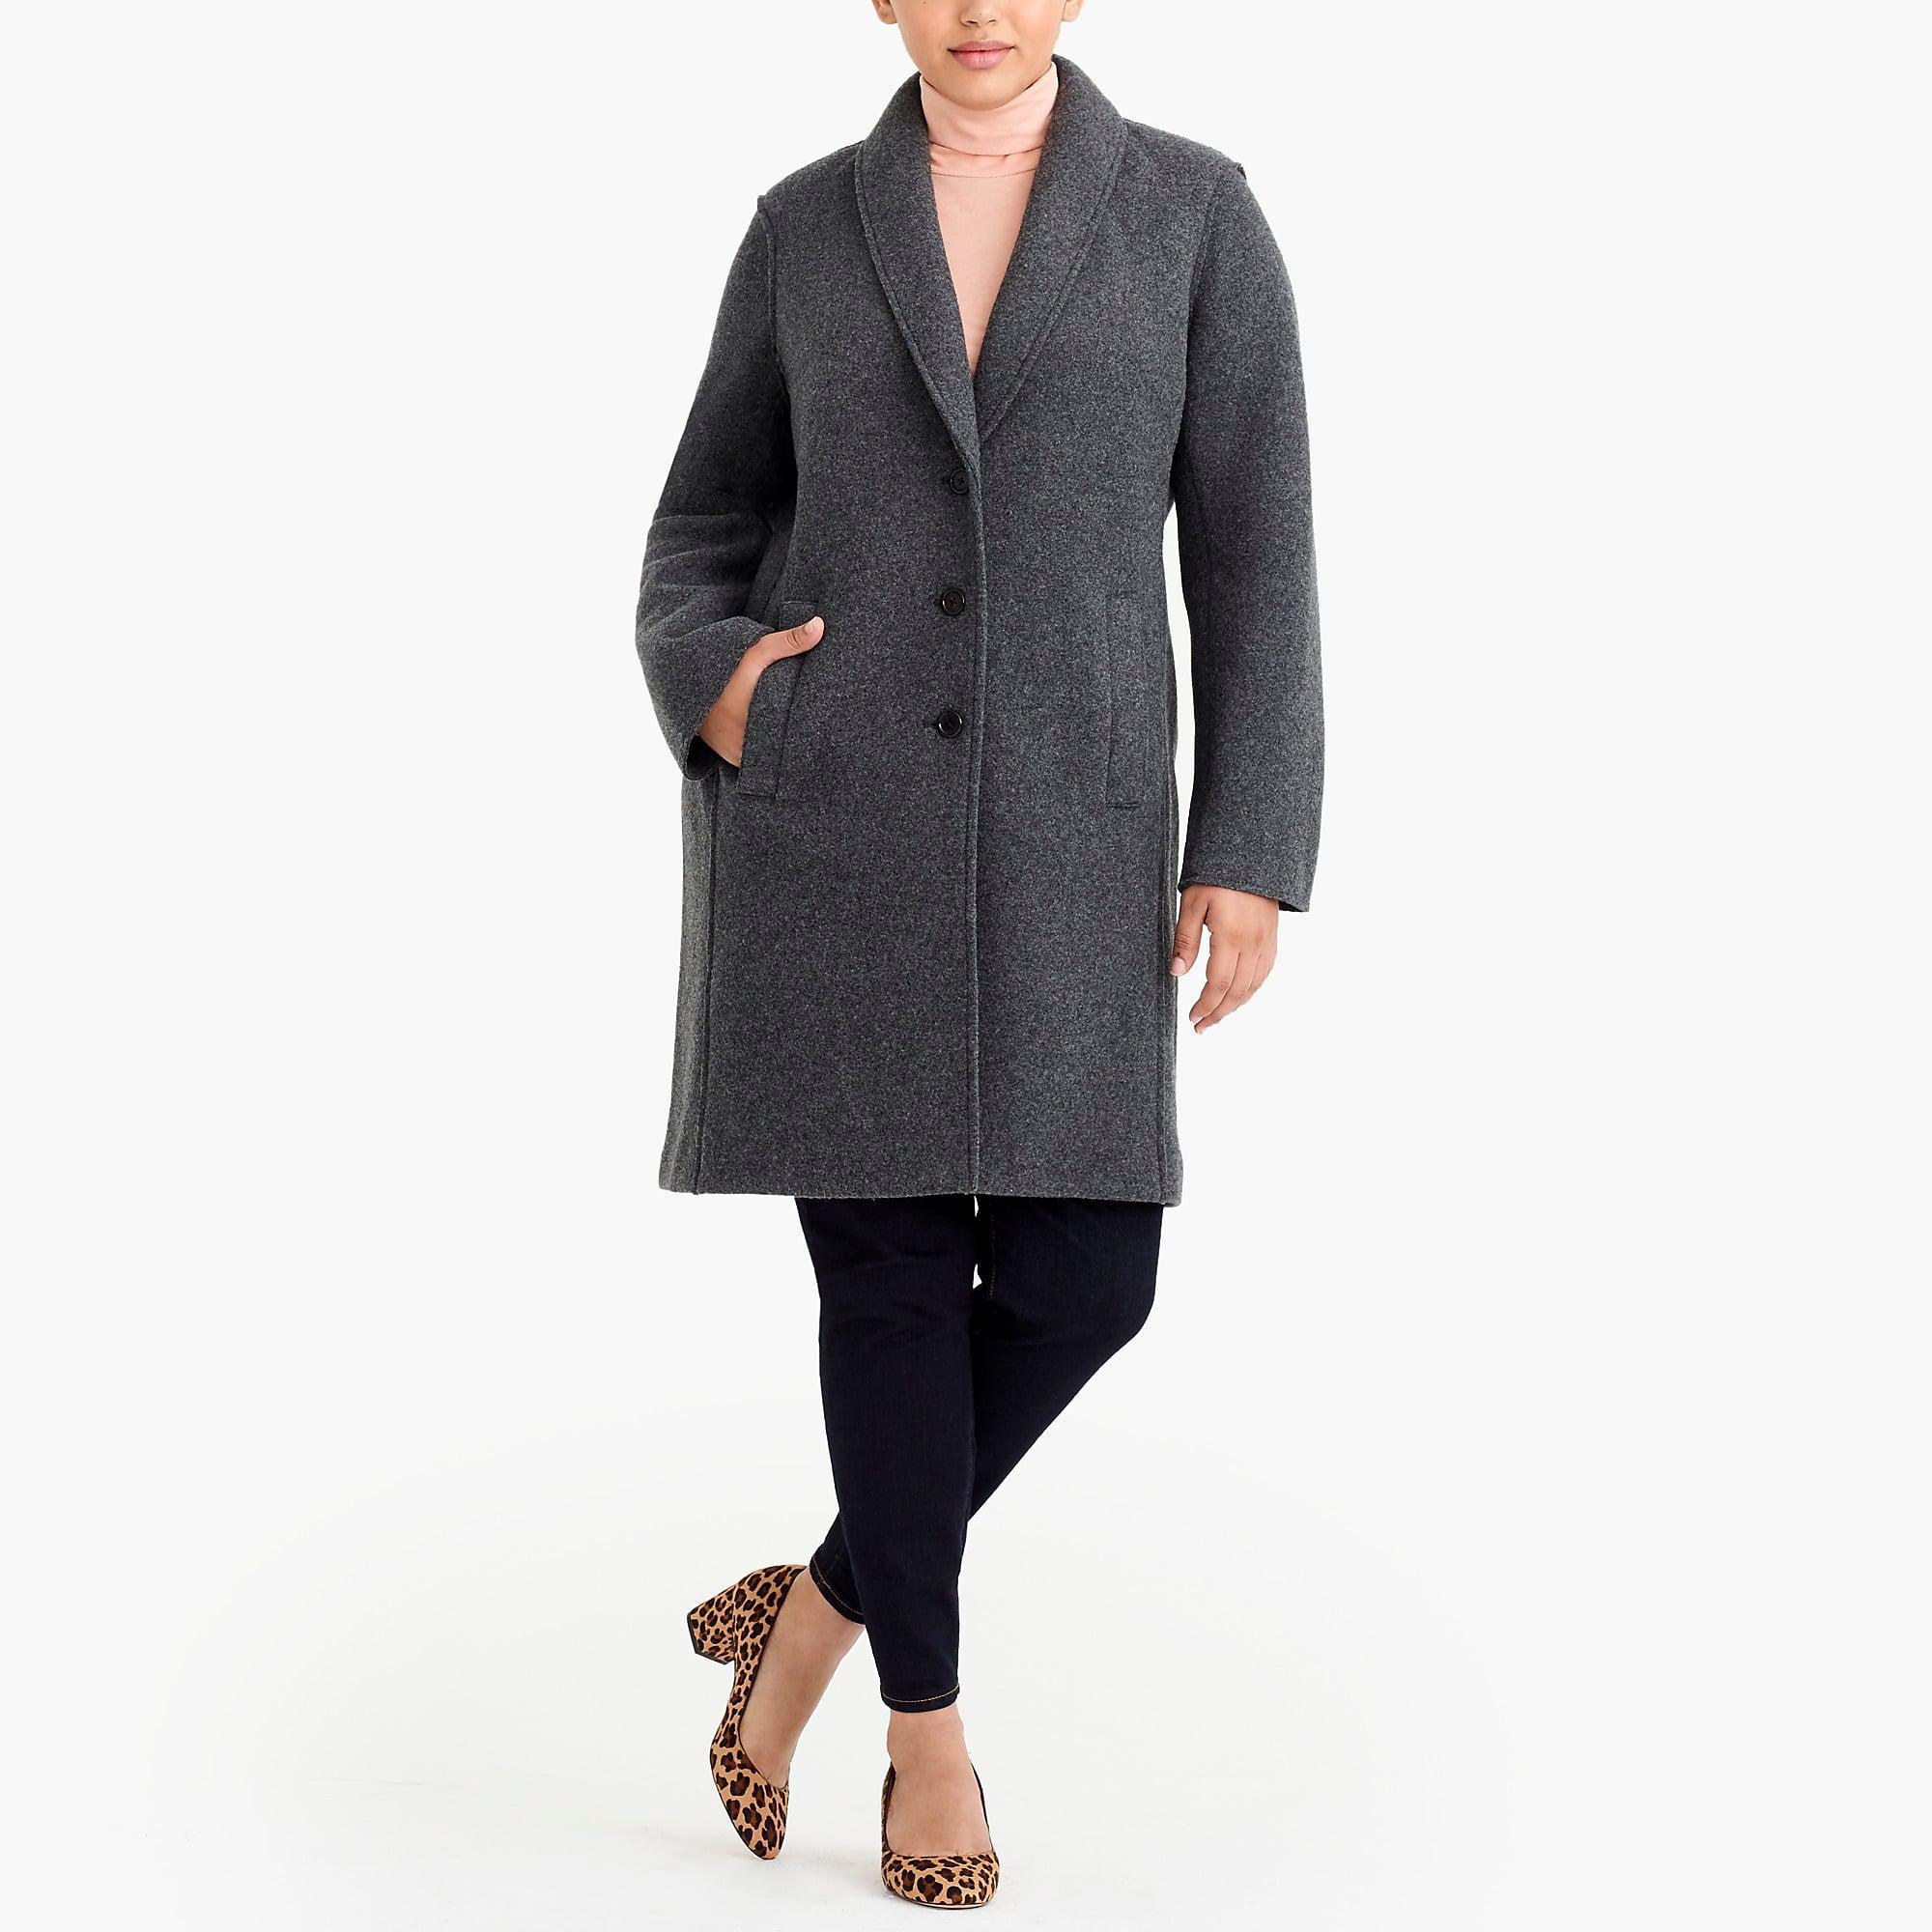 36487b06d21 Lyst - J.Crew Boiled Wool Topcoat in Black